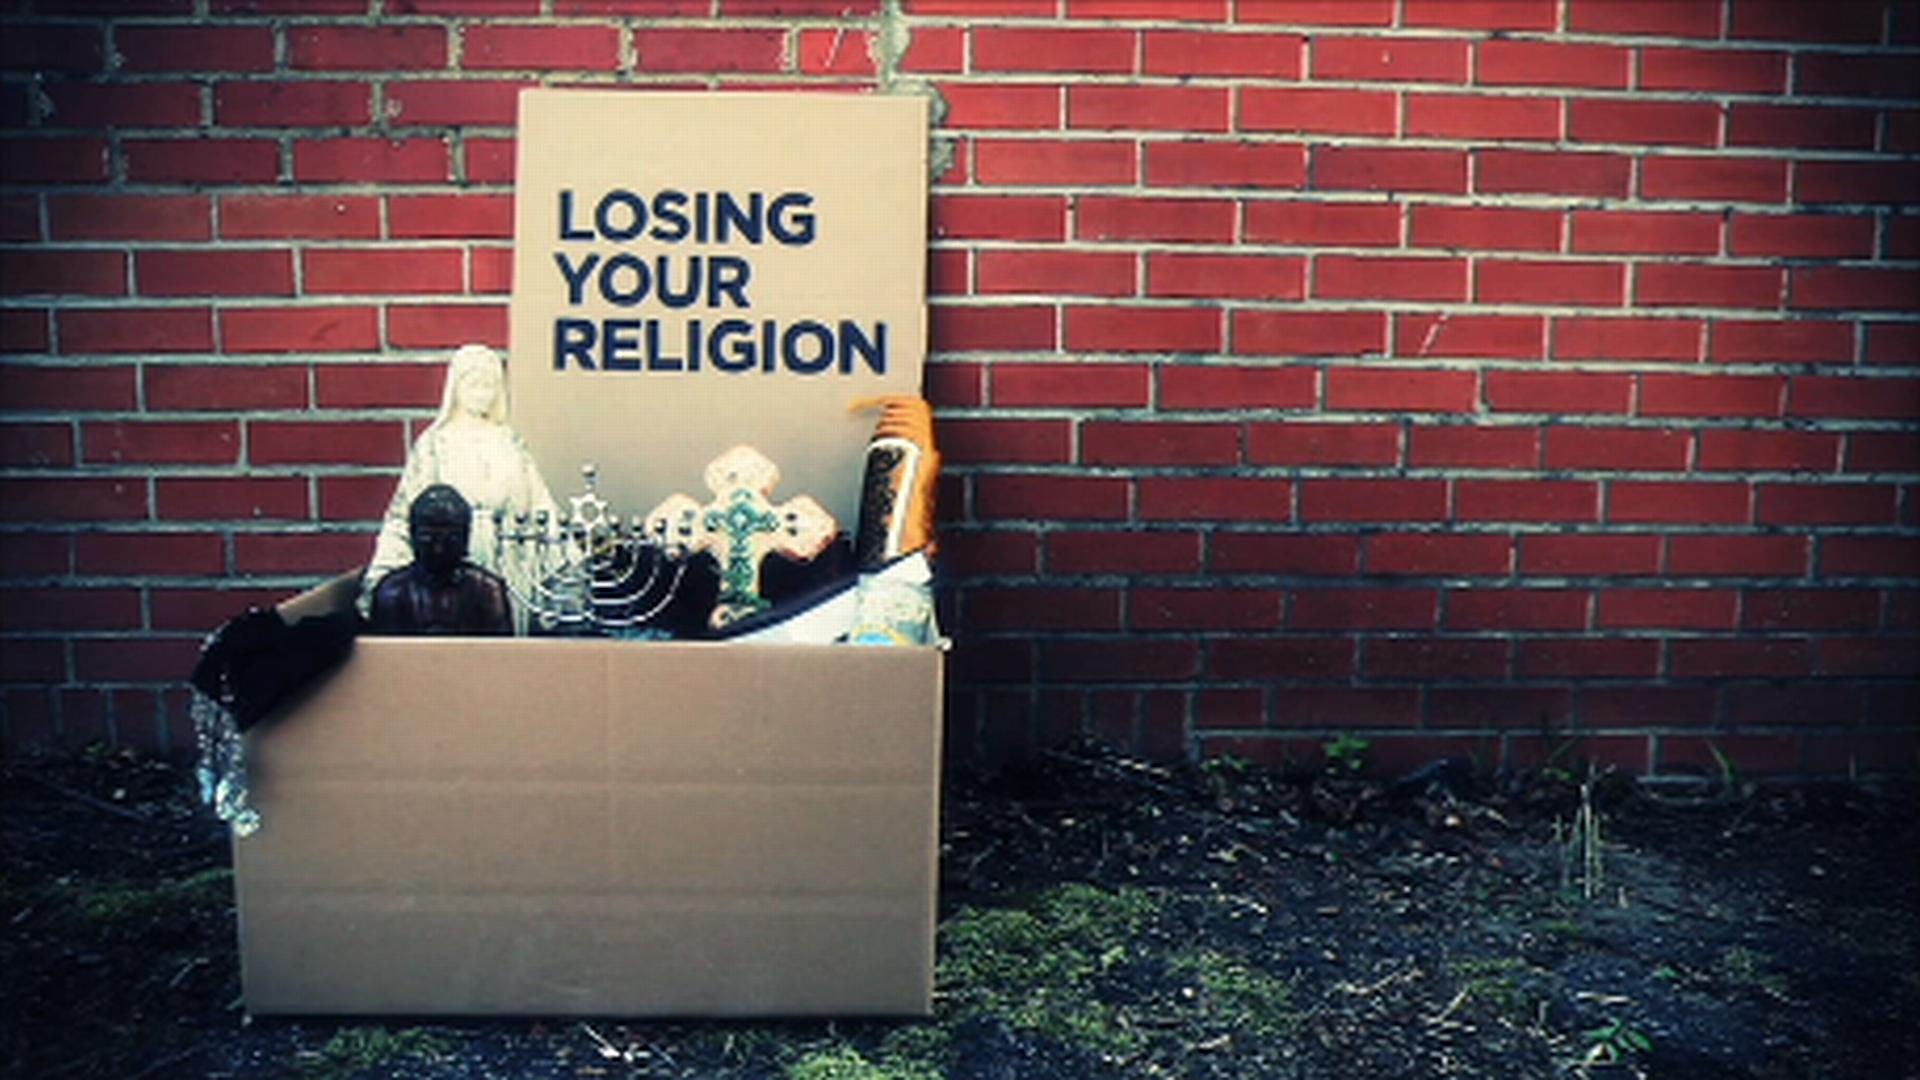 - Losing Your Religion 3: The Eight CommandmentsNovember 4, 2018Speaker: Aaron Laramore